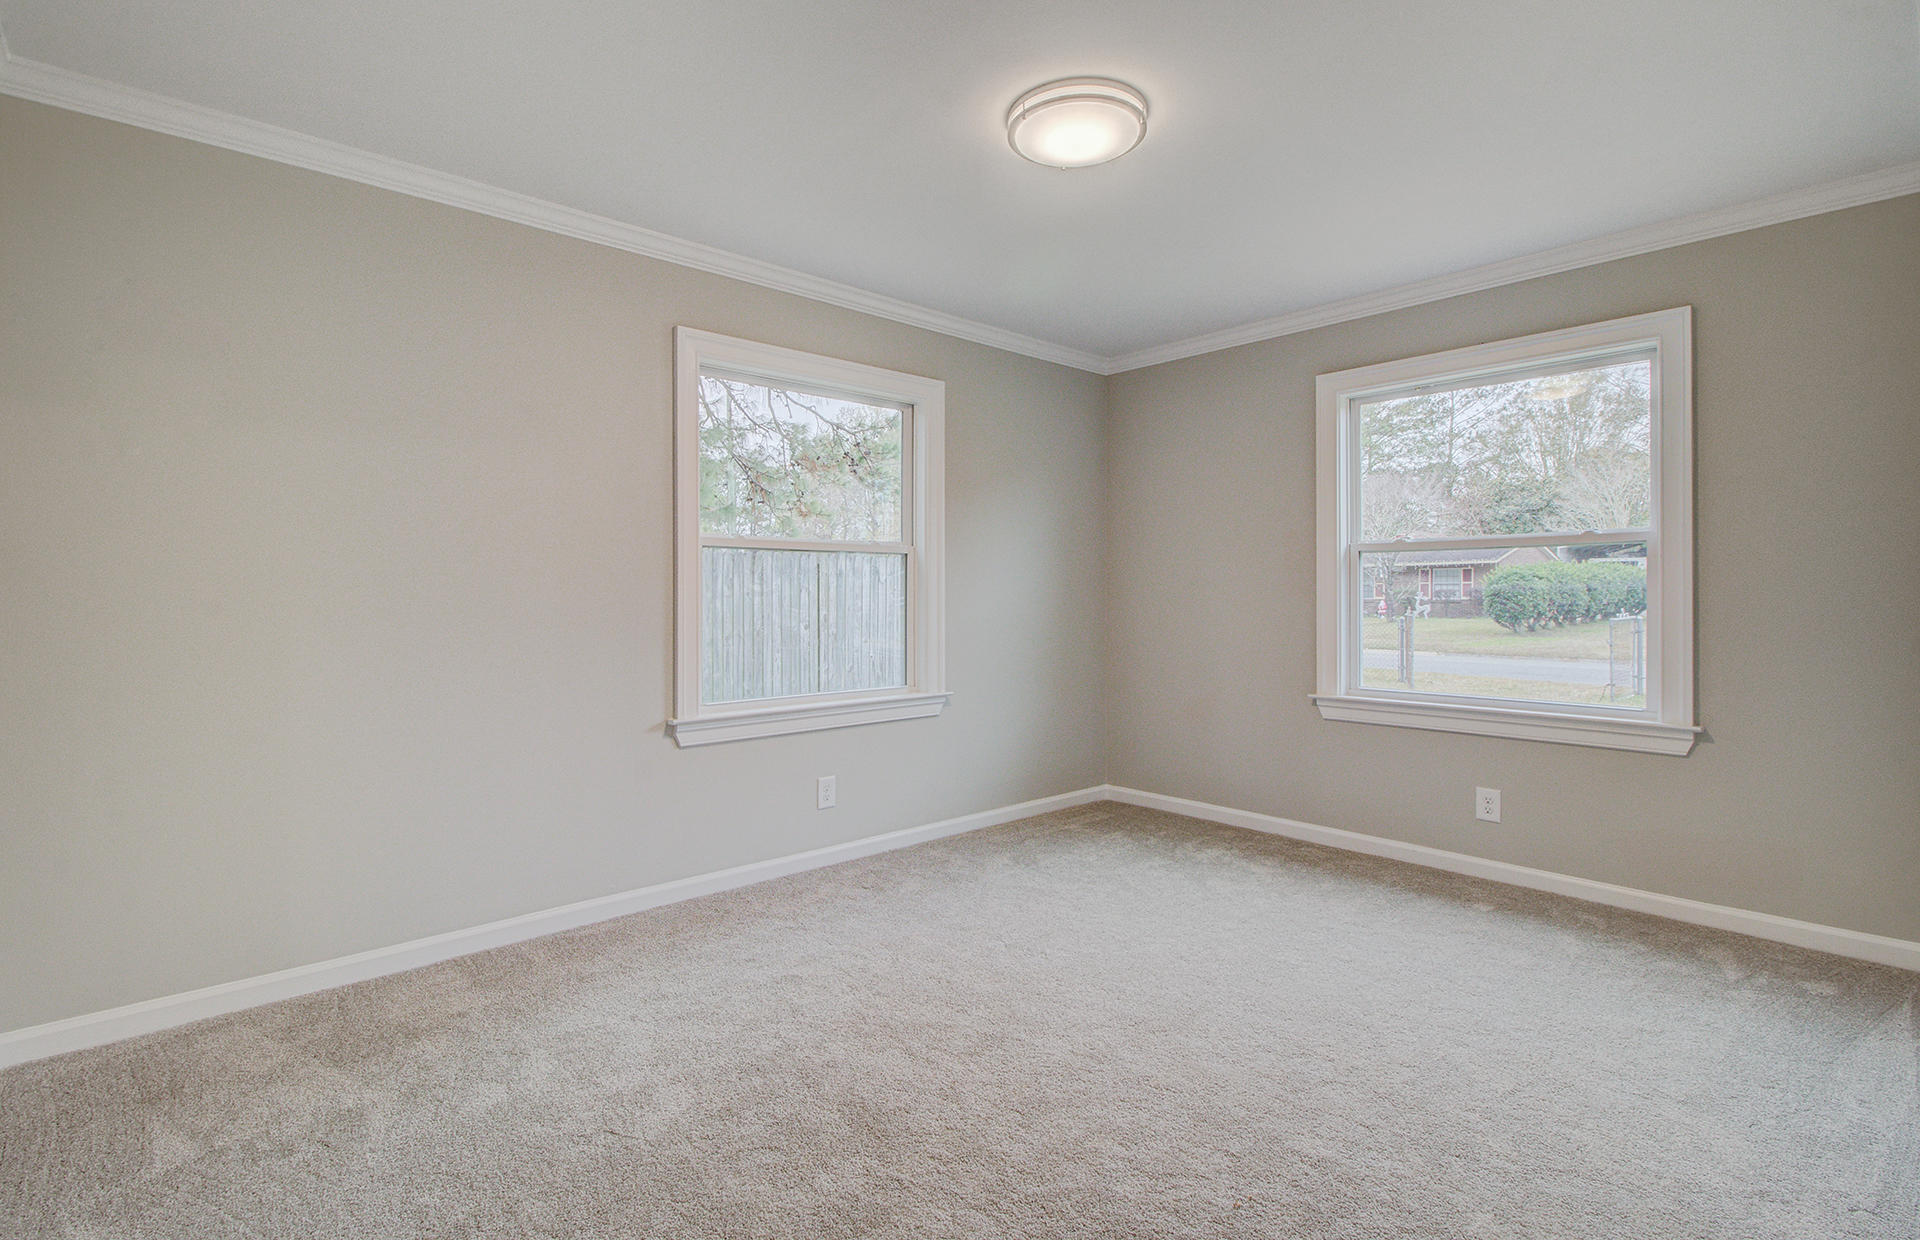 Sedgefield Section I Homes For Sale - 30 Aldene, Goose Creek, SC - 11